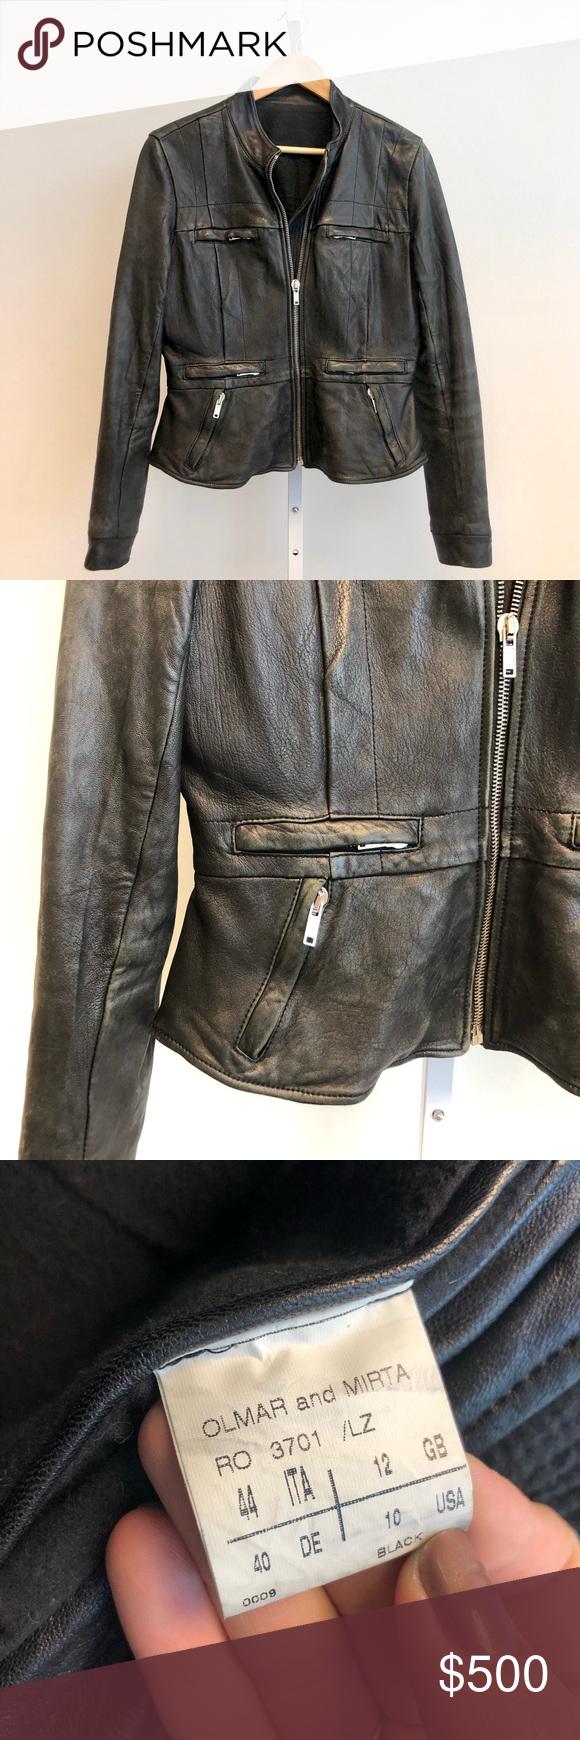 Rick Owens Distressed Leather Jacket IT44 Fits 6/8 Black